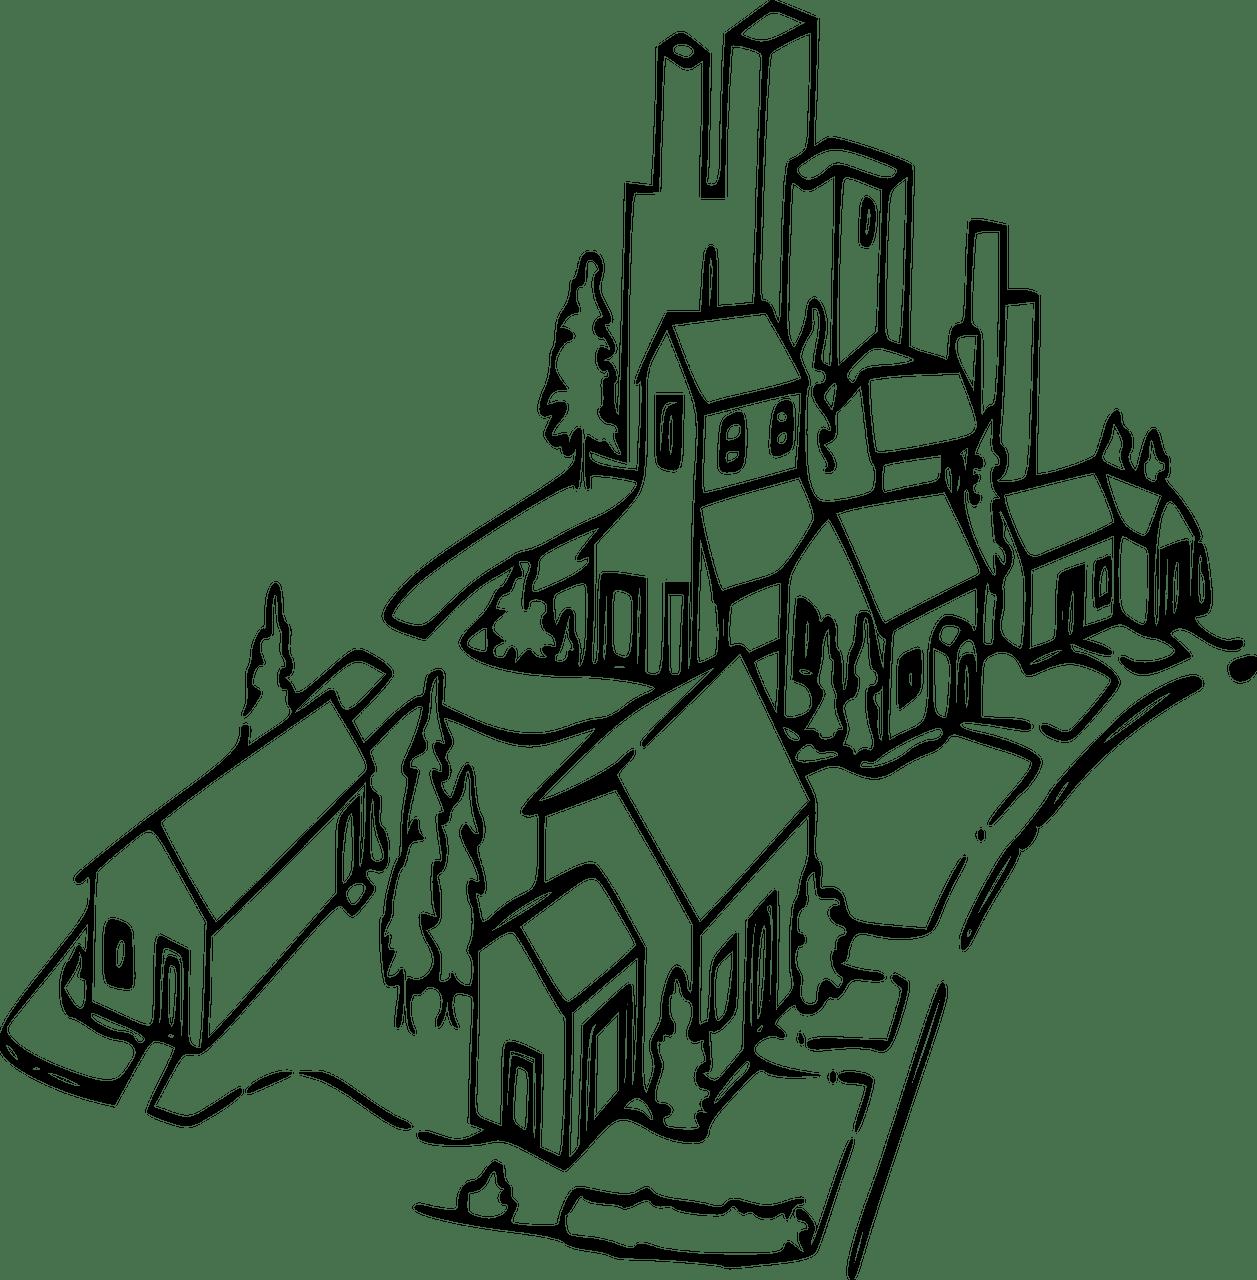 free community drawing easy #92621920